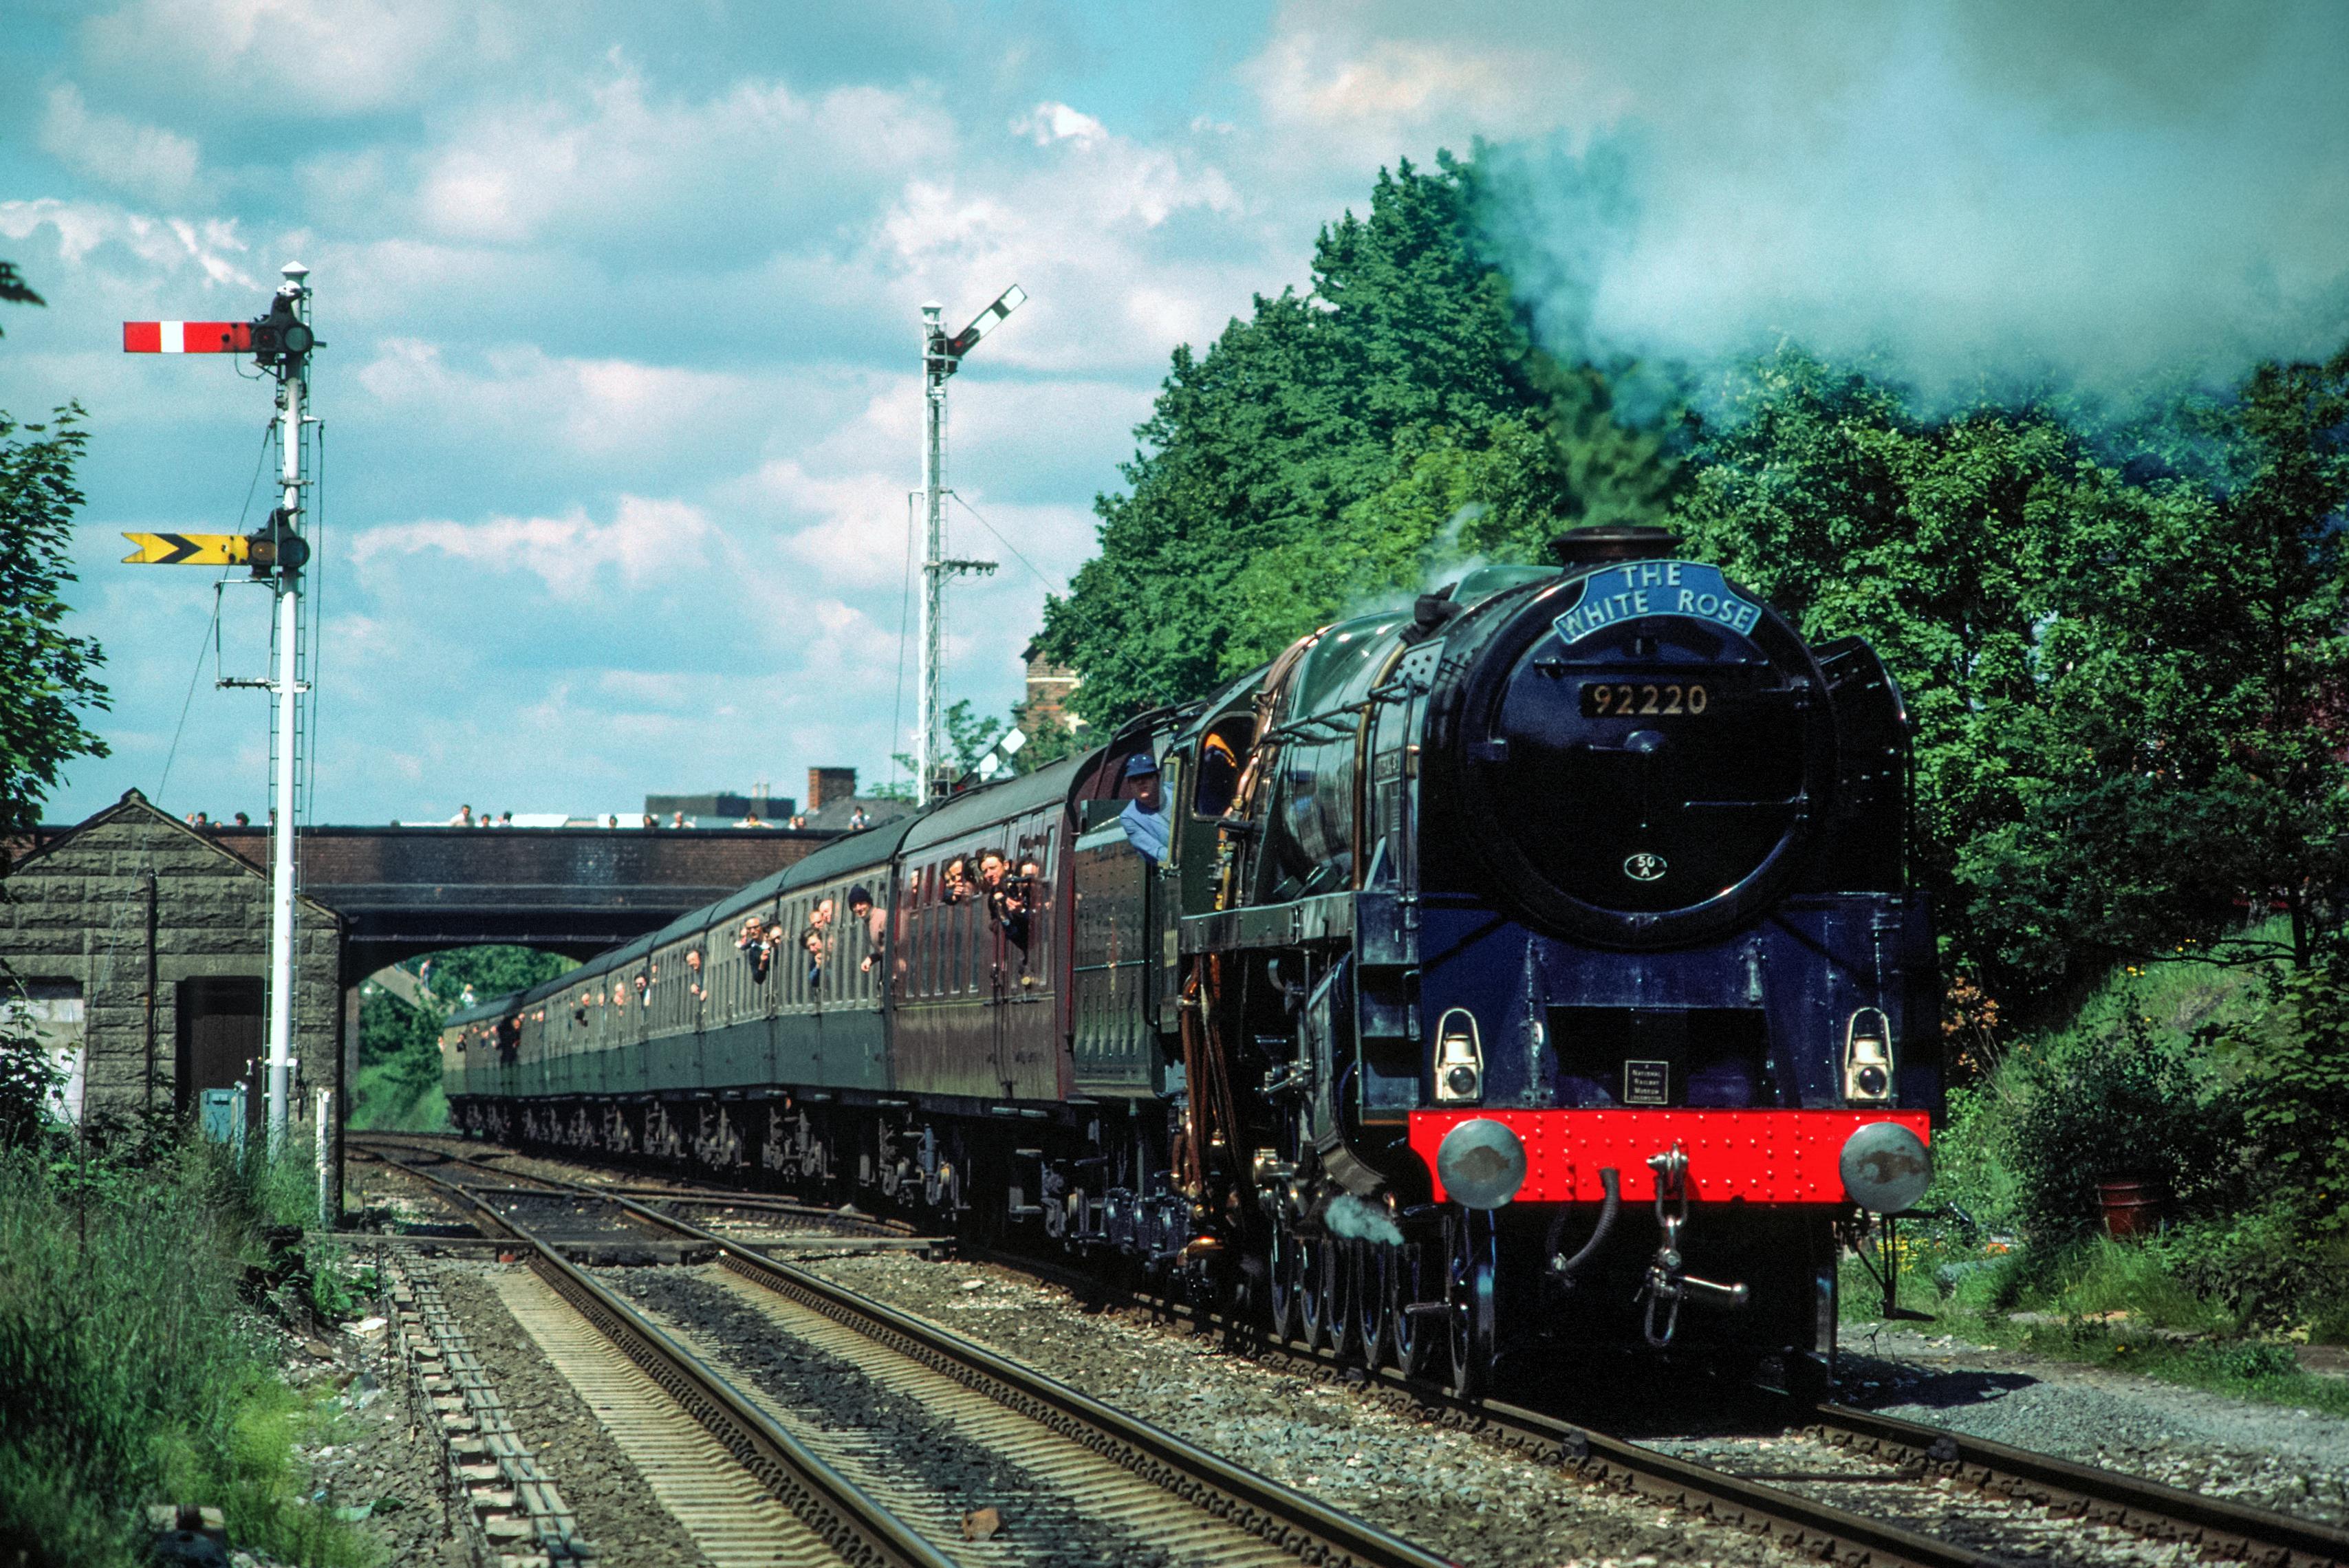 92220 Evening Star with York-Shrewsbury tour at Hale 15/6/85